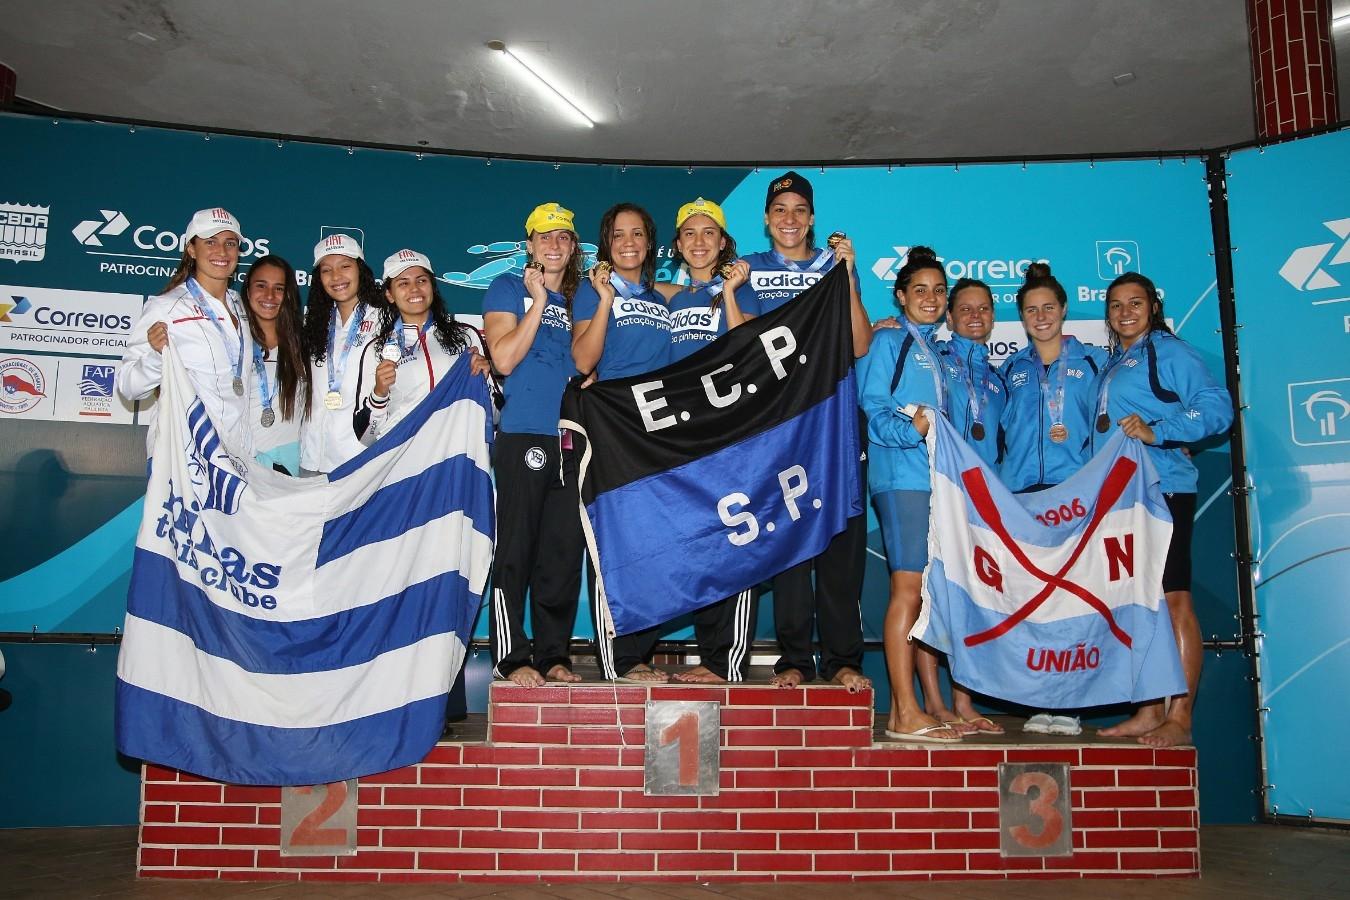 Trofeu Jose Finkel de Natacao no Clube Internacional de Regatas. 14 de Setembro de 2016, Santos, SP, Brasil. Foto:Satiro Sodré/SSPress.